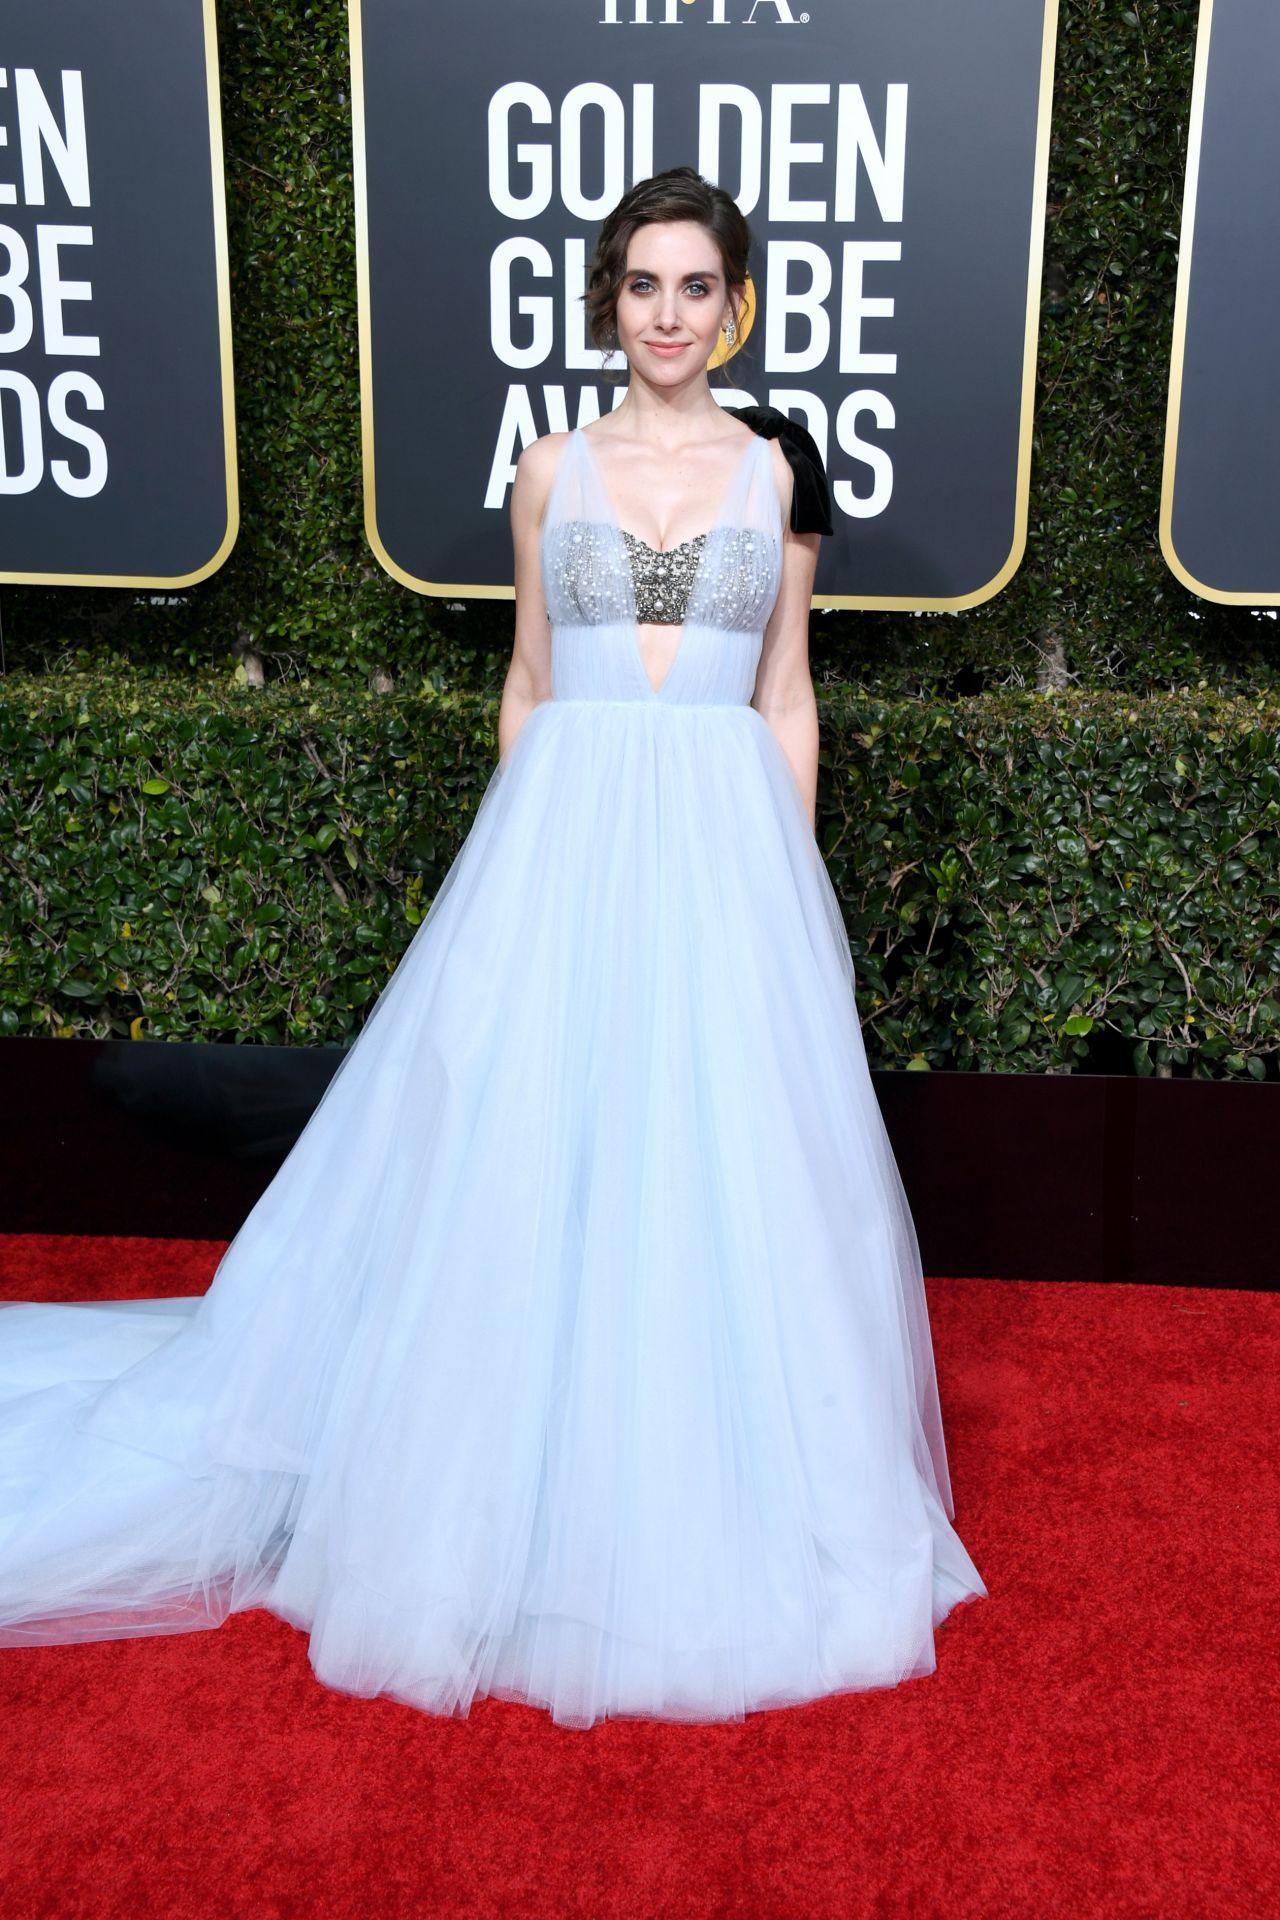 Alison Brie 2019 Golden Globe Awards